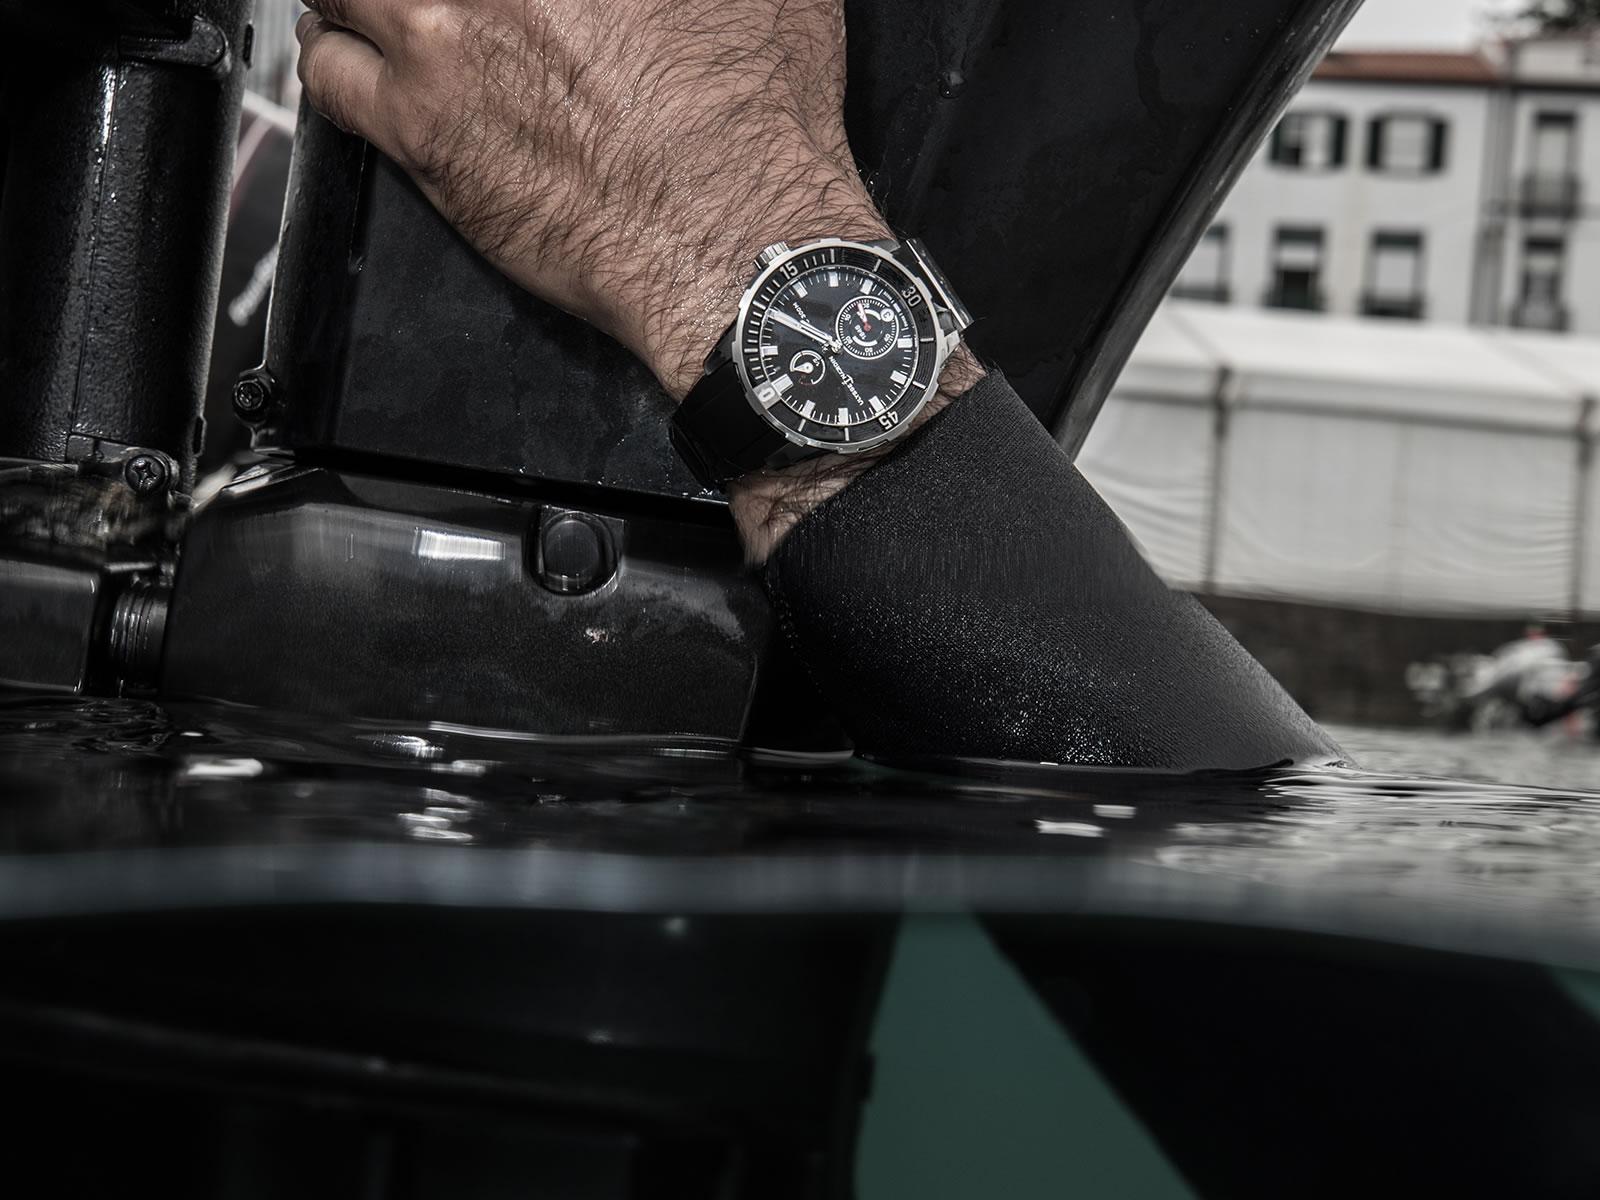 ulysse-nardin-diver-chronometer-2018-models-8-.jpg